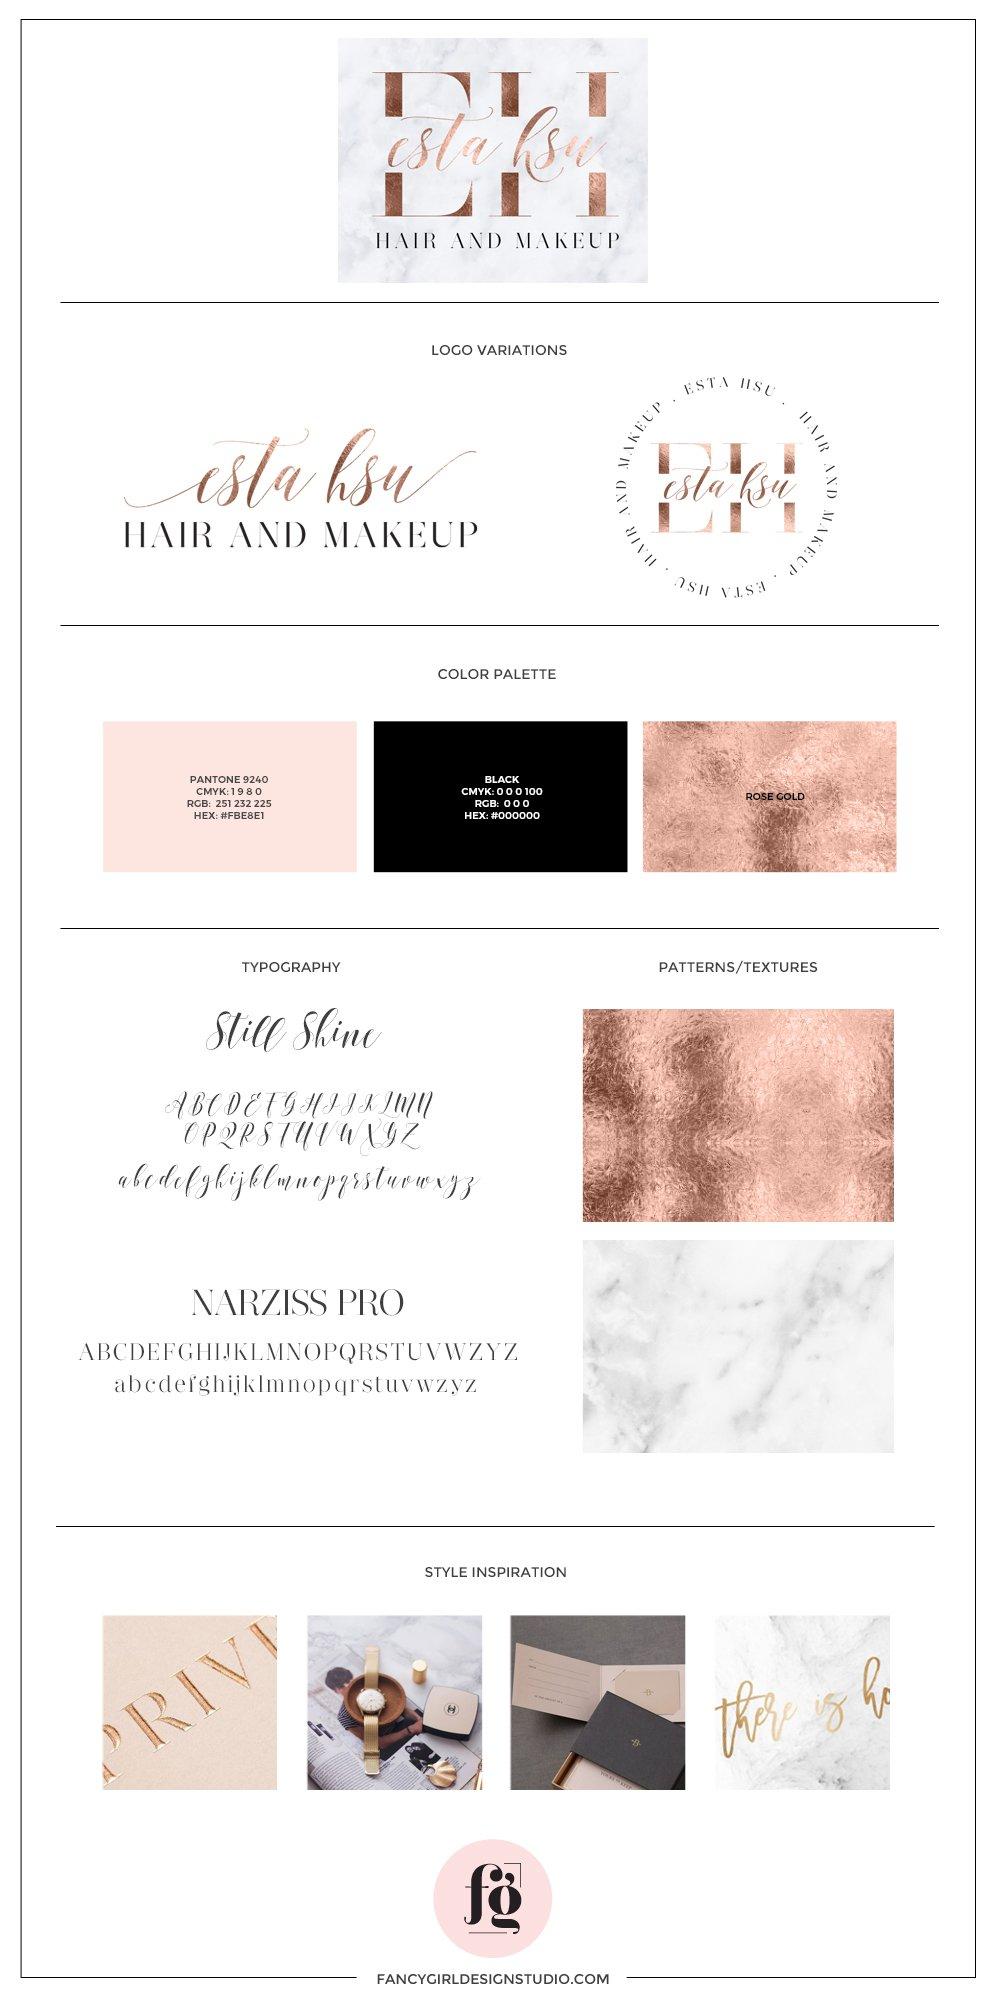 Brand guide for Esta Hsu by Fancy Girl Design Studio